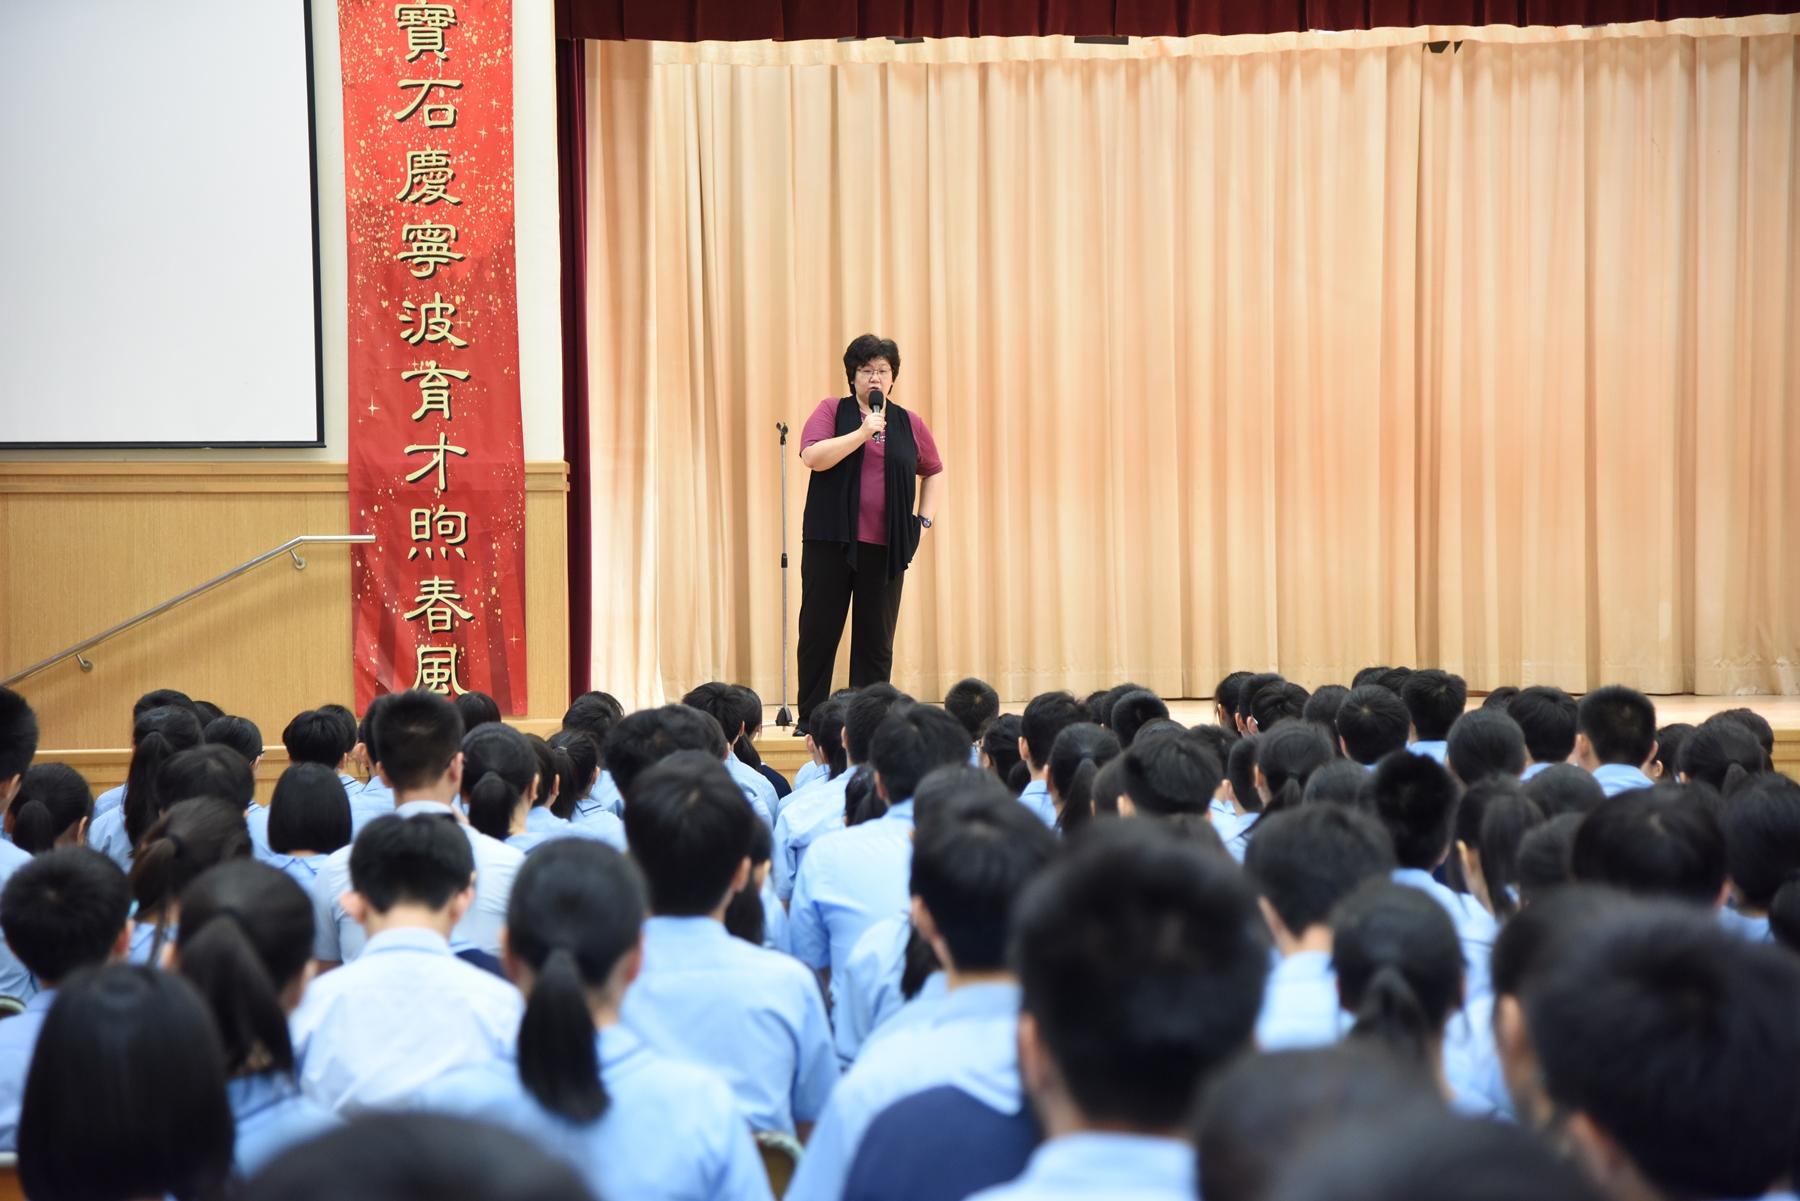 http://npc.edu.hk/sites/default/files/dsc_0454.jpg